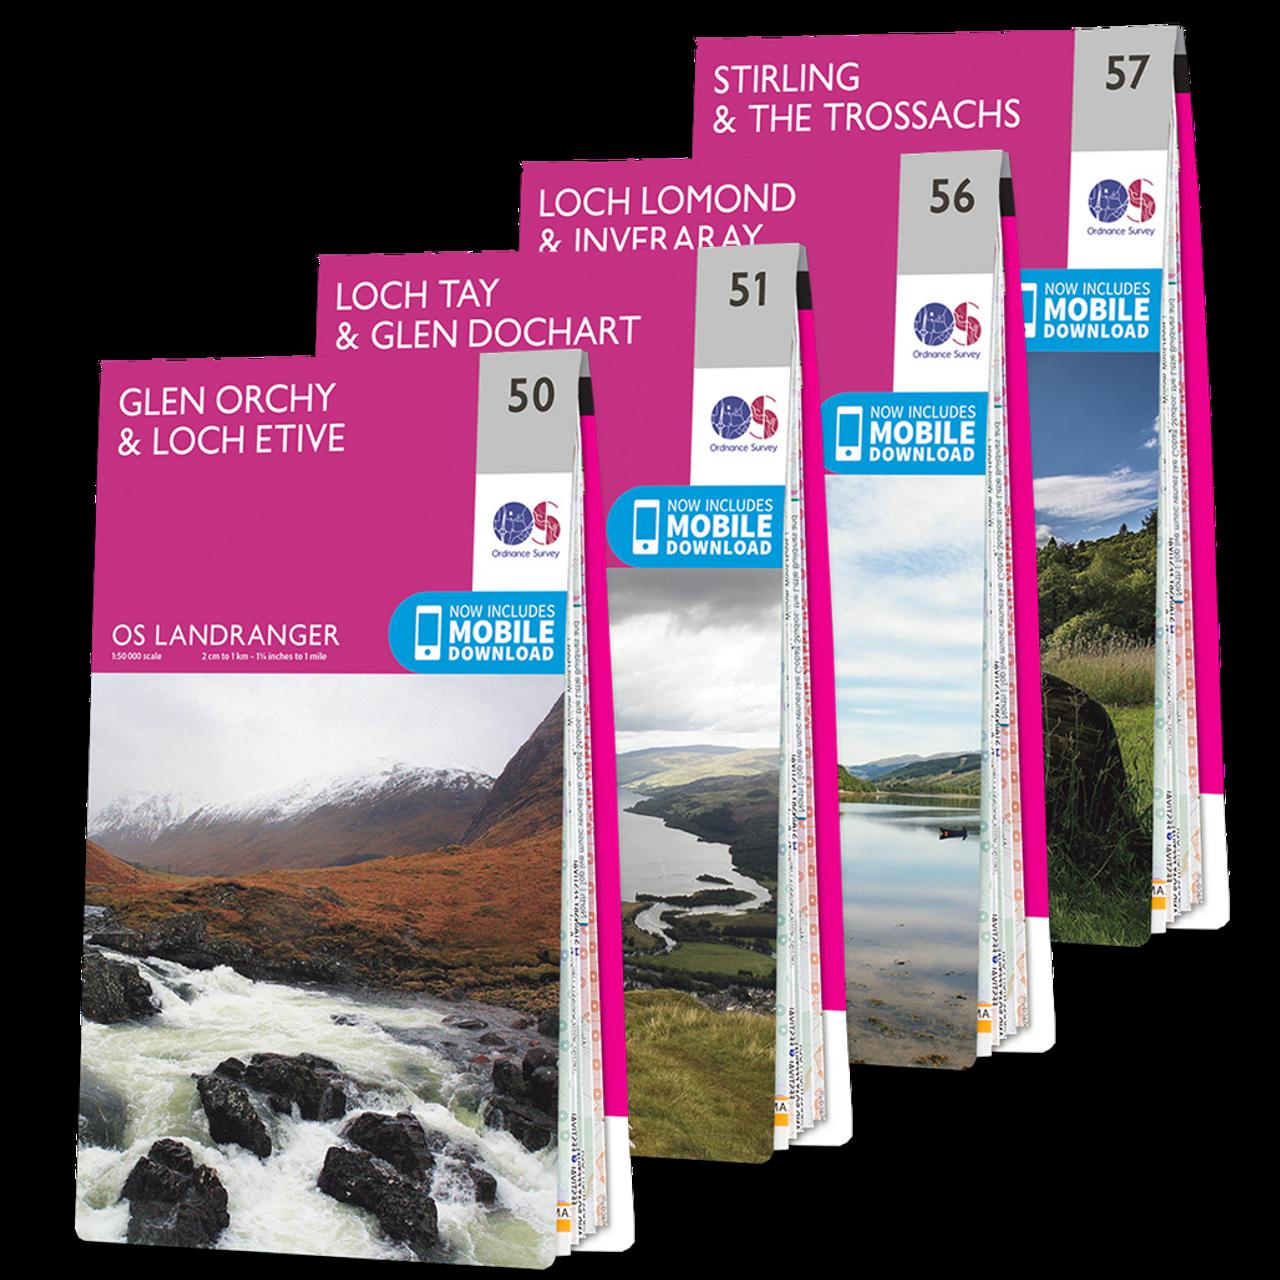 Os Landranger Loch Lomond And The Trossachs Map Set